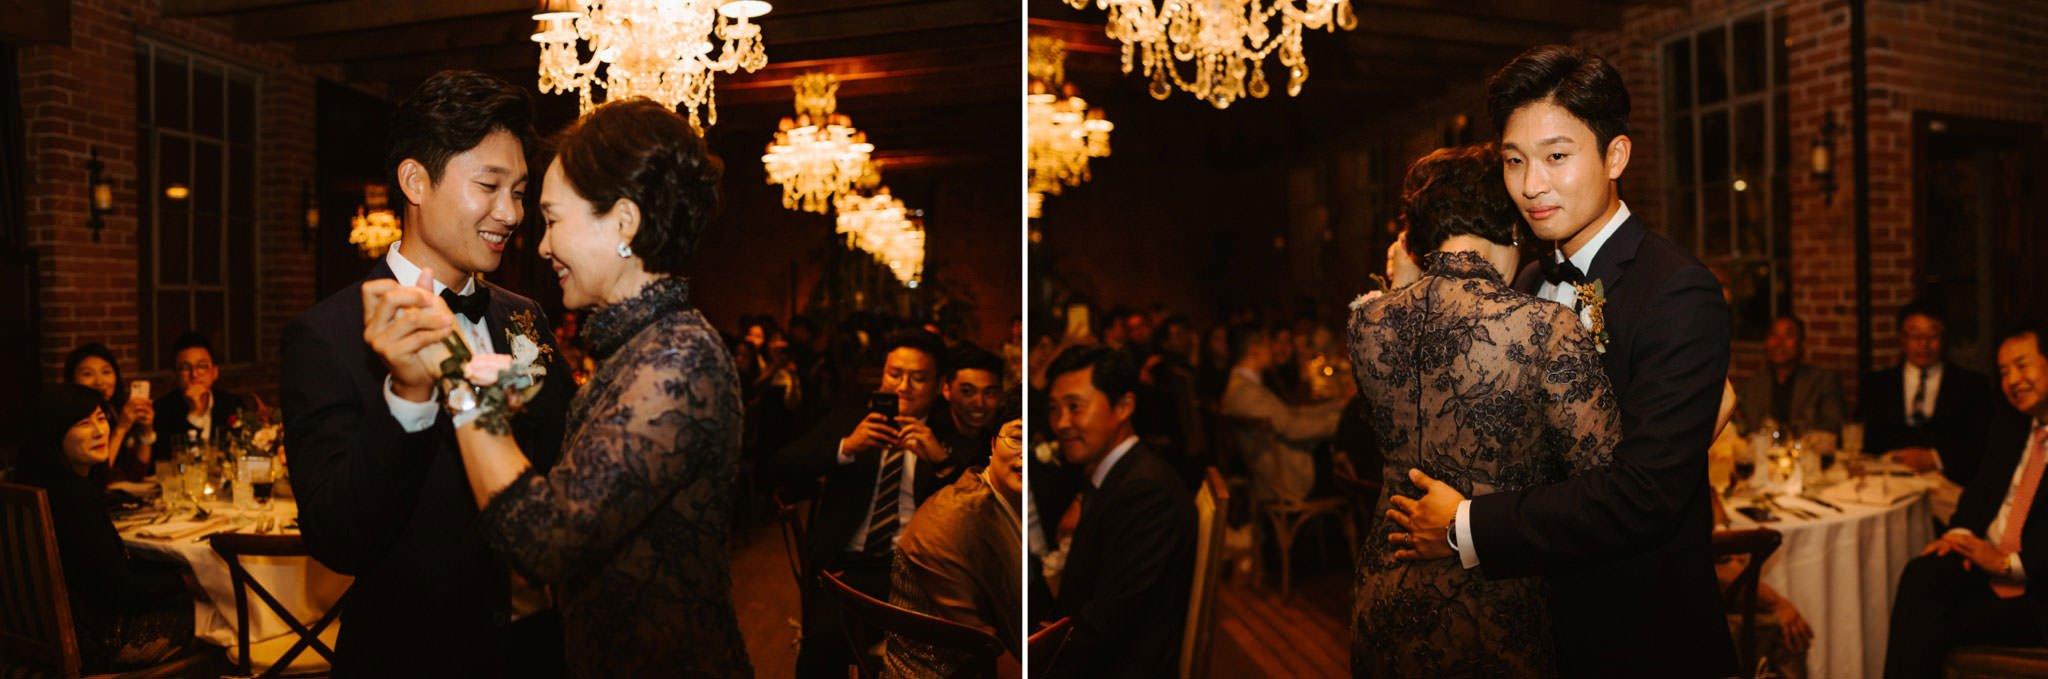 carondelet house wedding 135